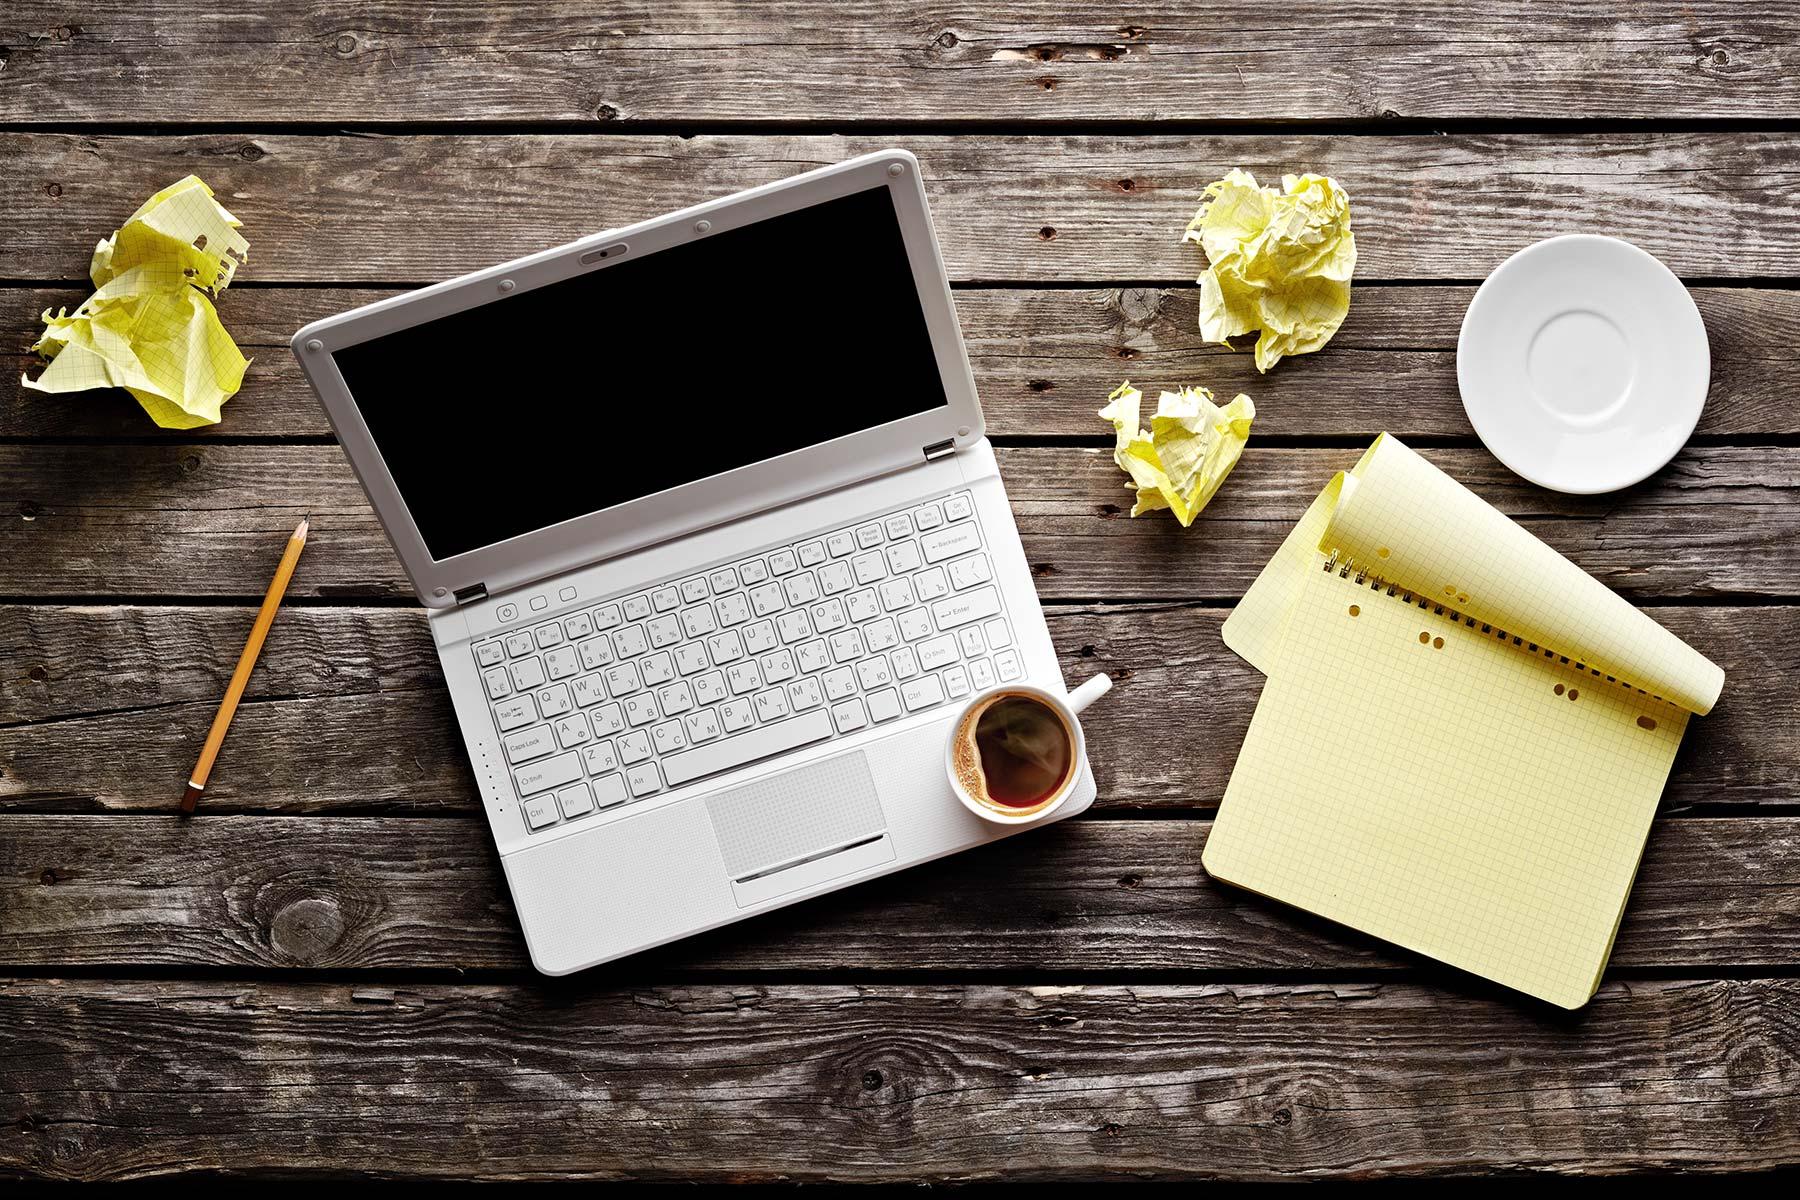 10 ways to ensure you write a good PhD thesis